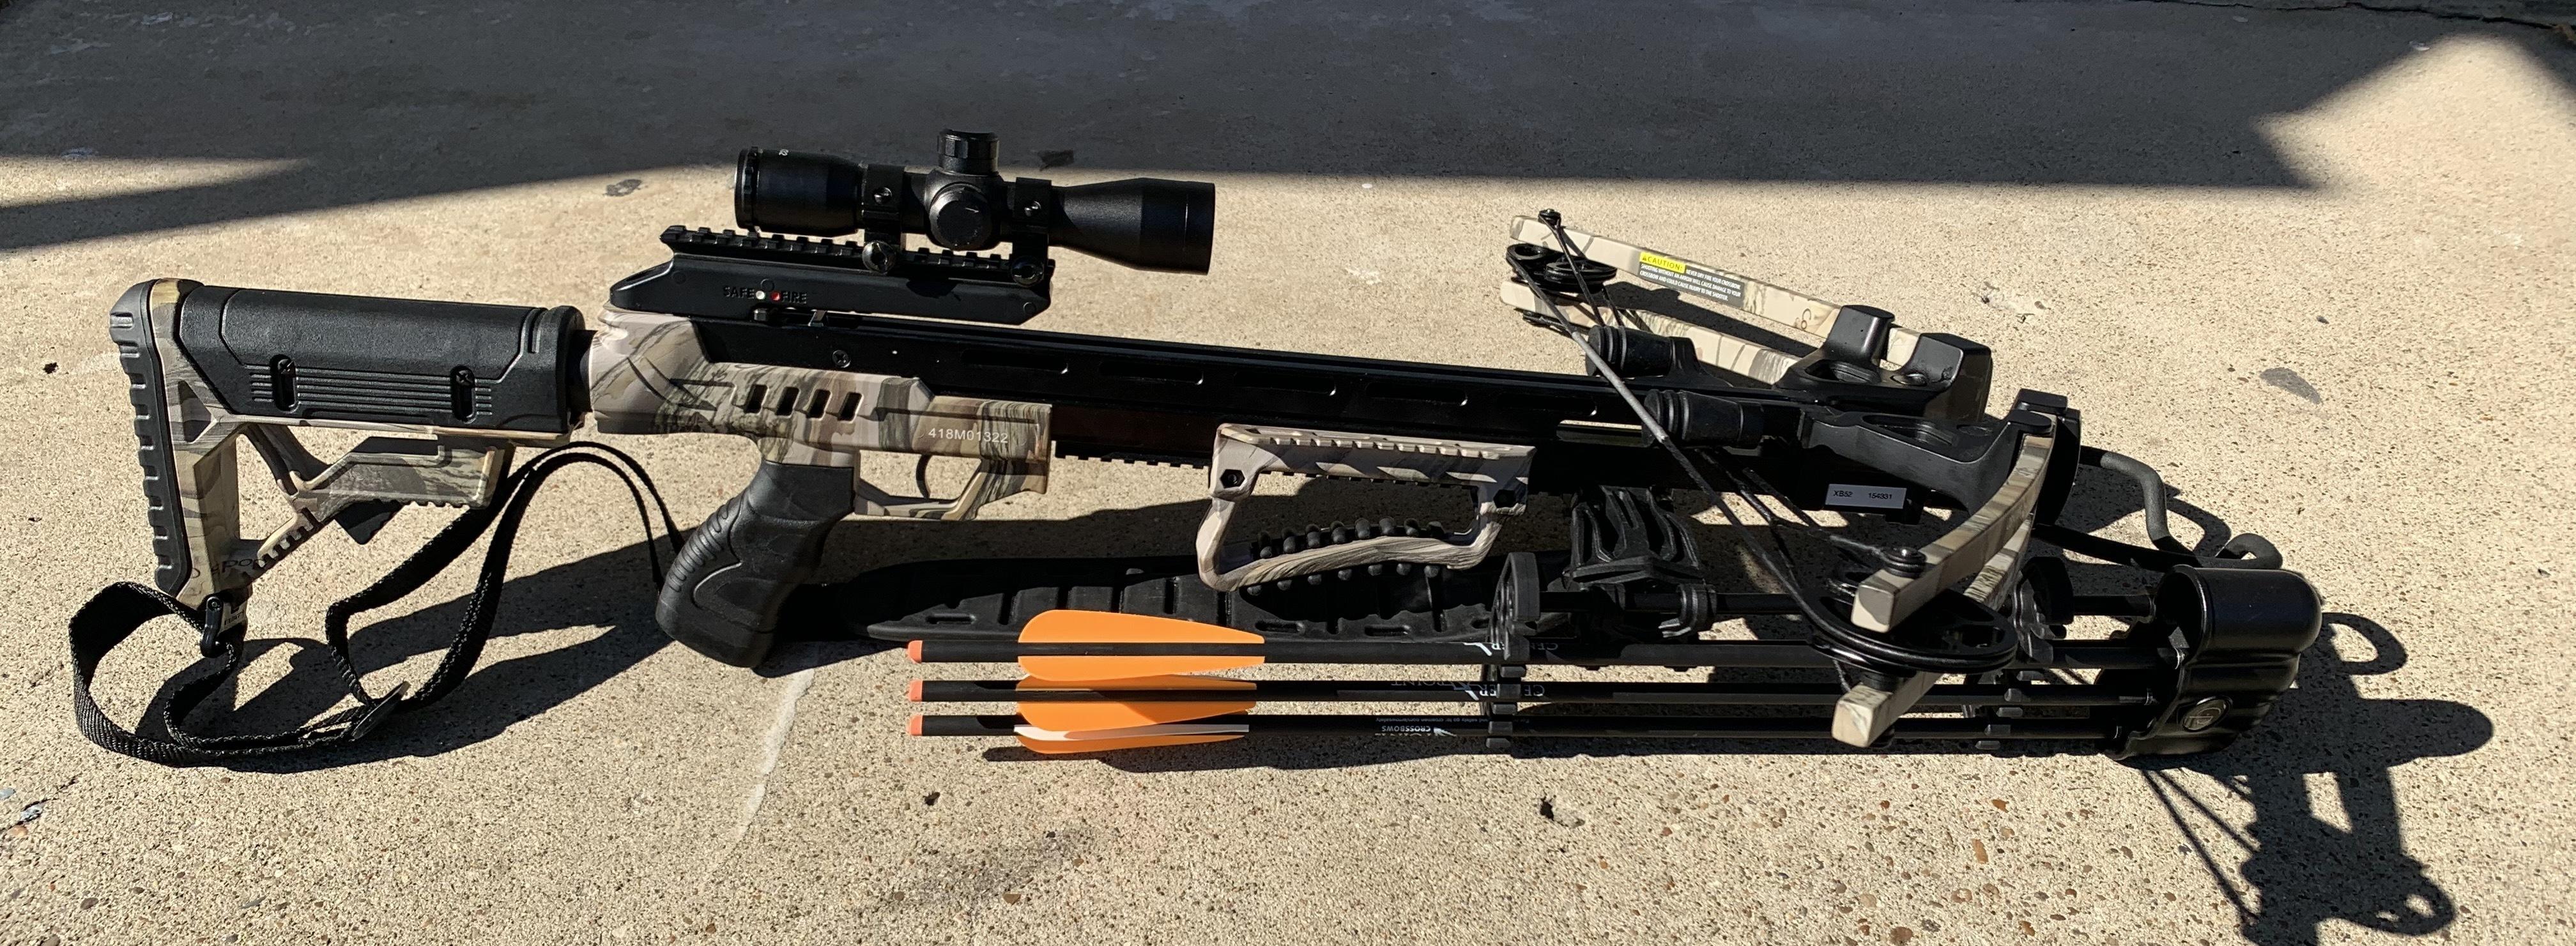 CenterPoint Specialist XL 370 Compound Crossbow